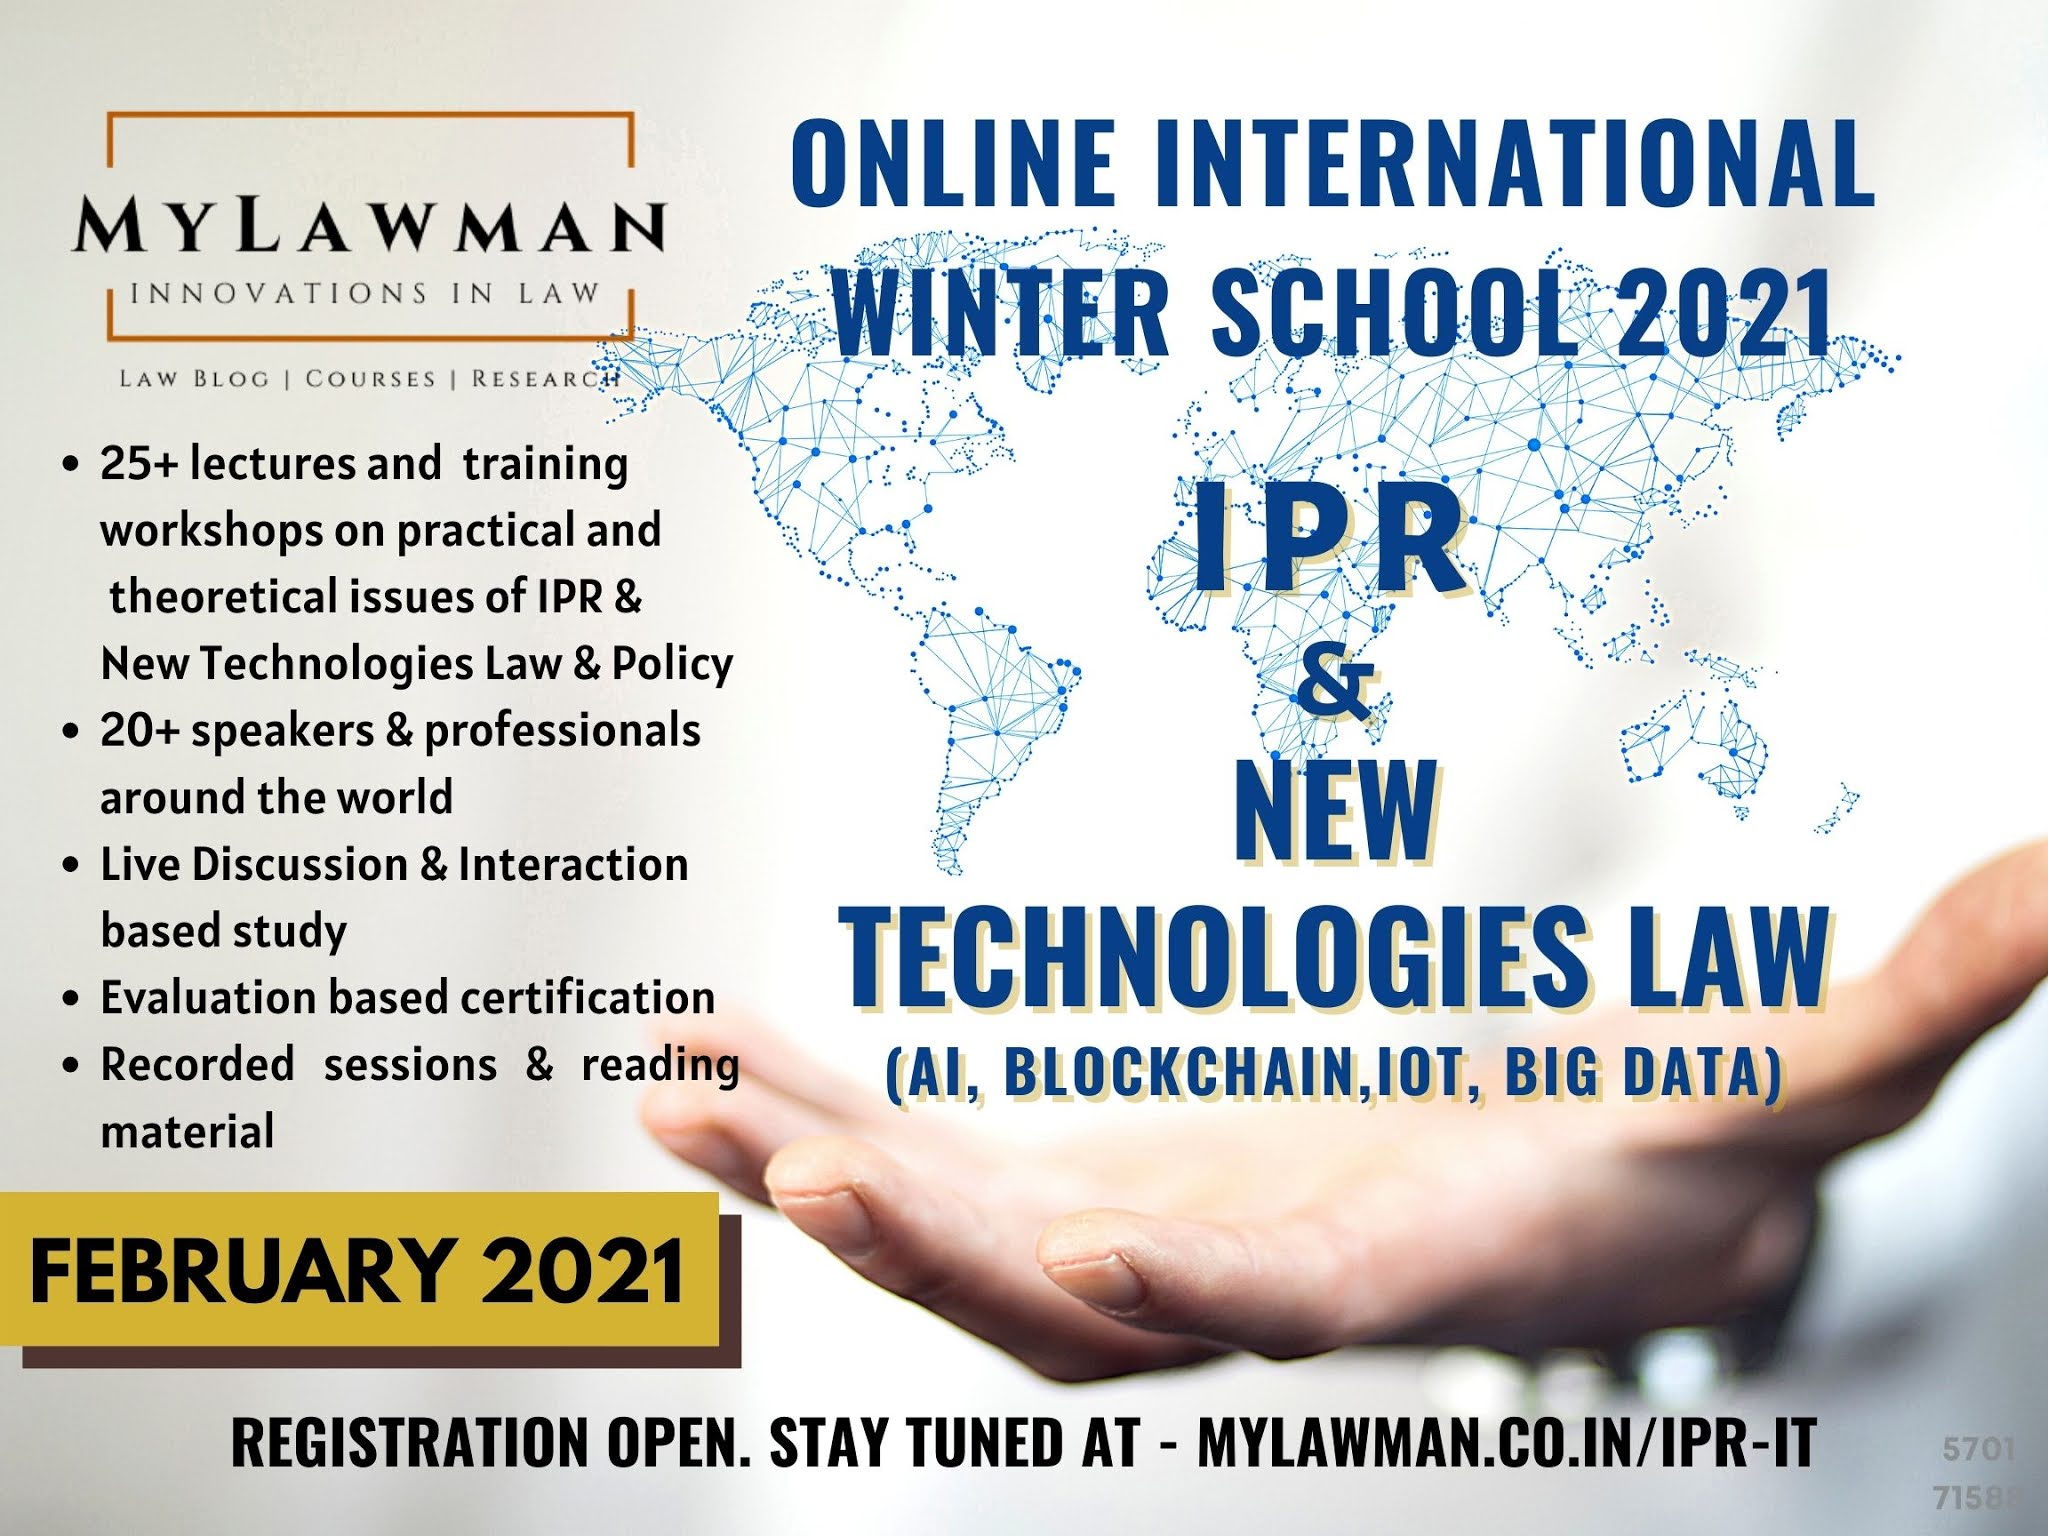 [Online] International Winter School on IPR & New Technology Law by MyLawman [Register by 2 February 2021]